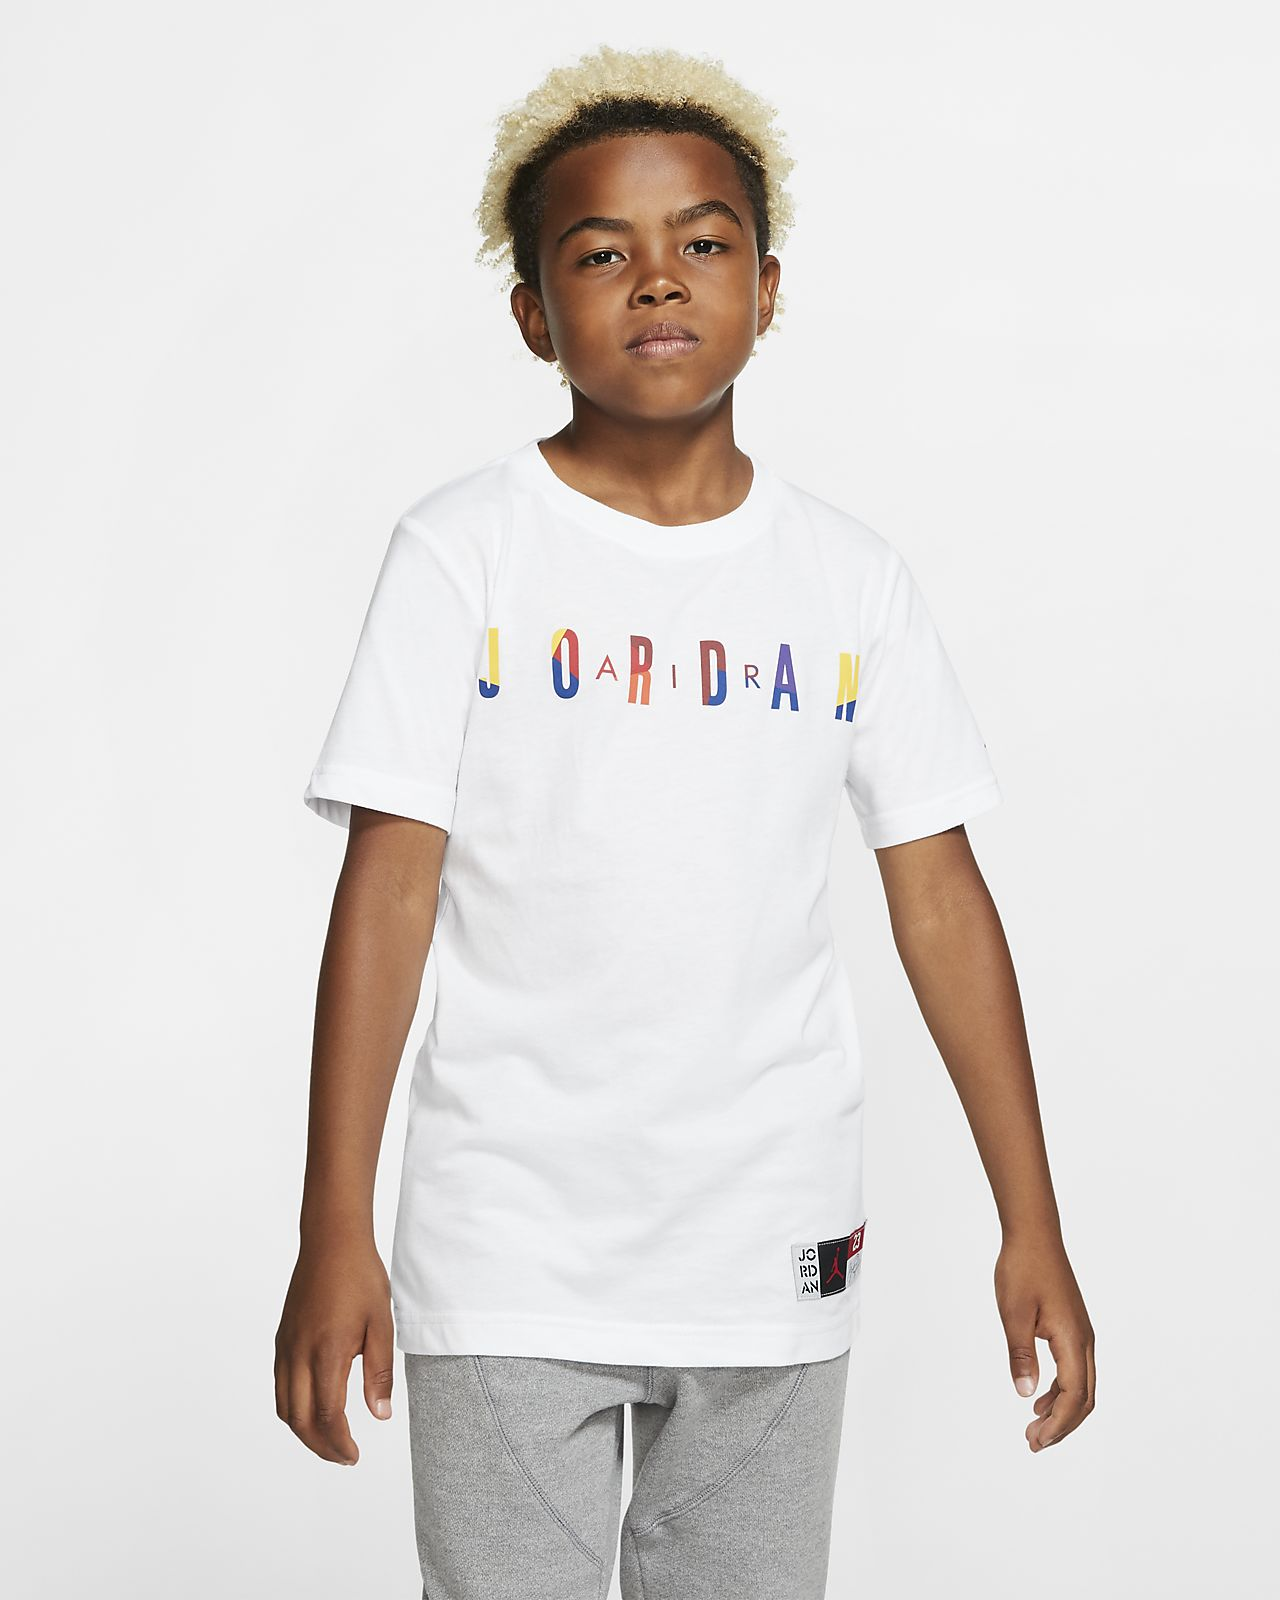 Air Jordan Big Kids' (Boys') Short Sleeve T Shirt